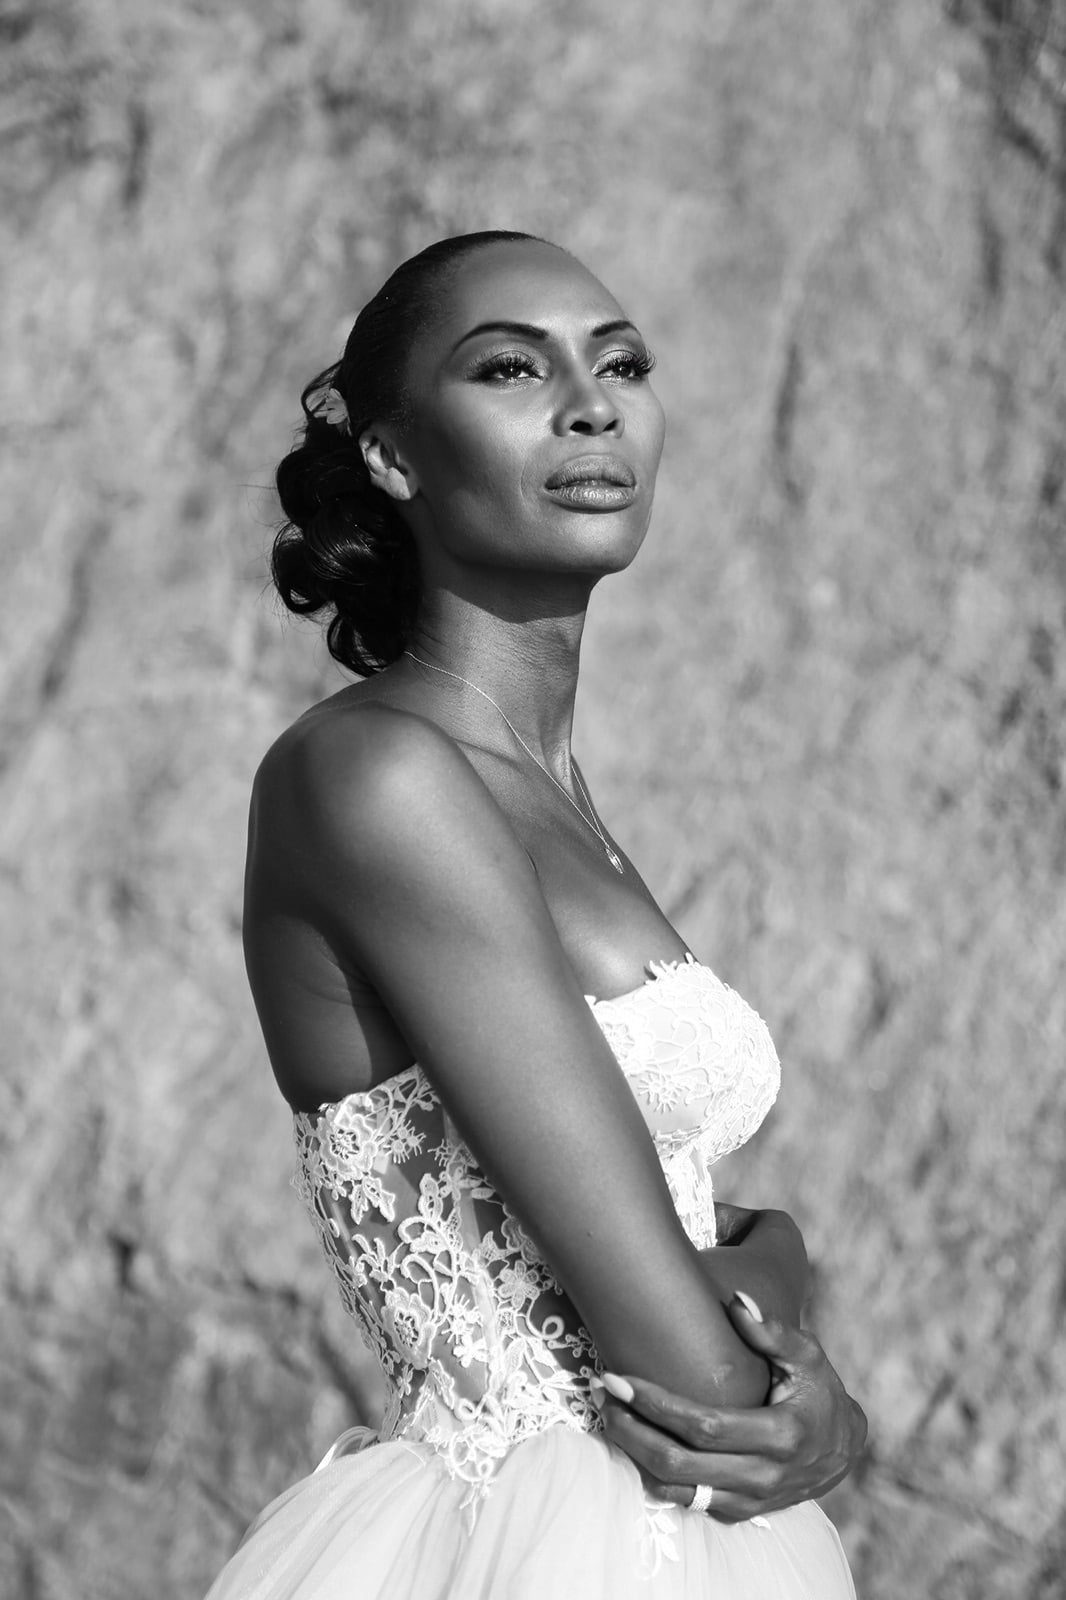 Dominique Jackson Trinidadian, American Actress, Model, Author, TV Personality